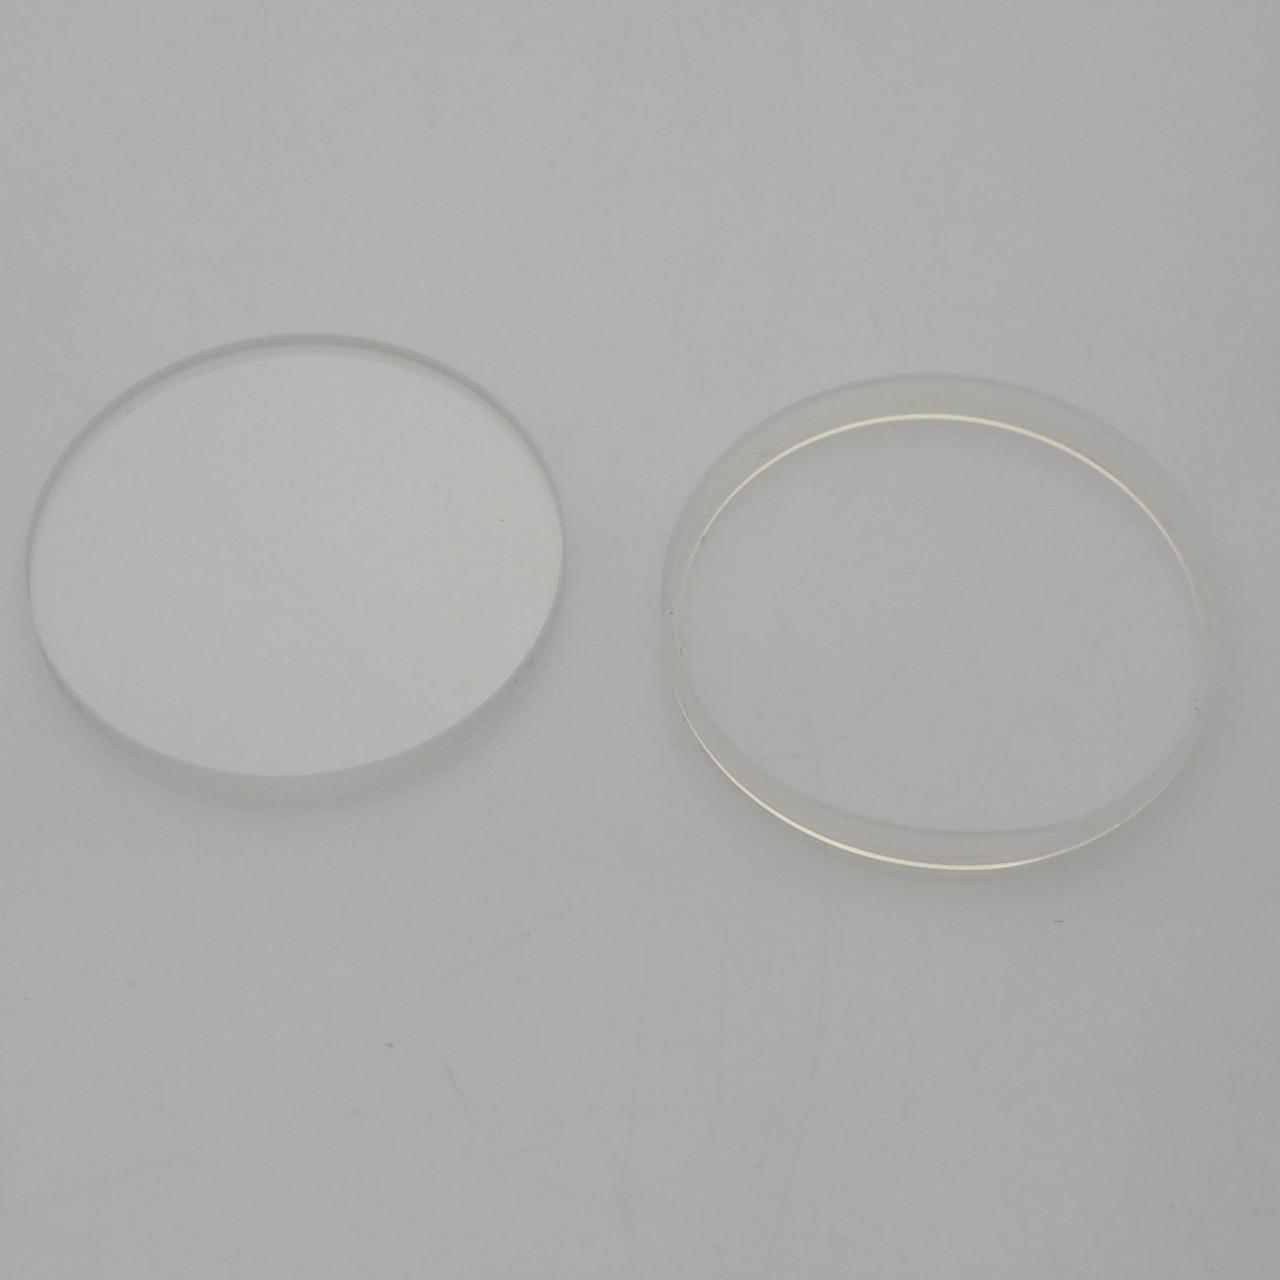 Mineralglas + Glasdichtung für Omega Flightmaster 36,0 x 3,0mm